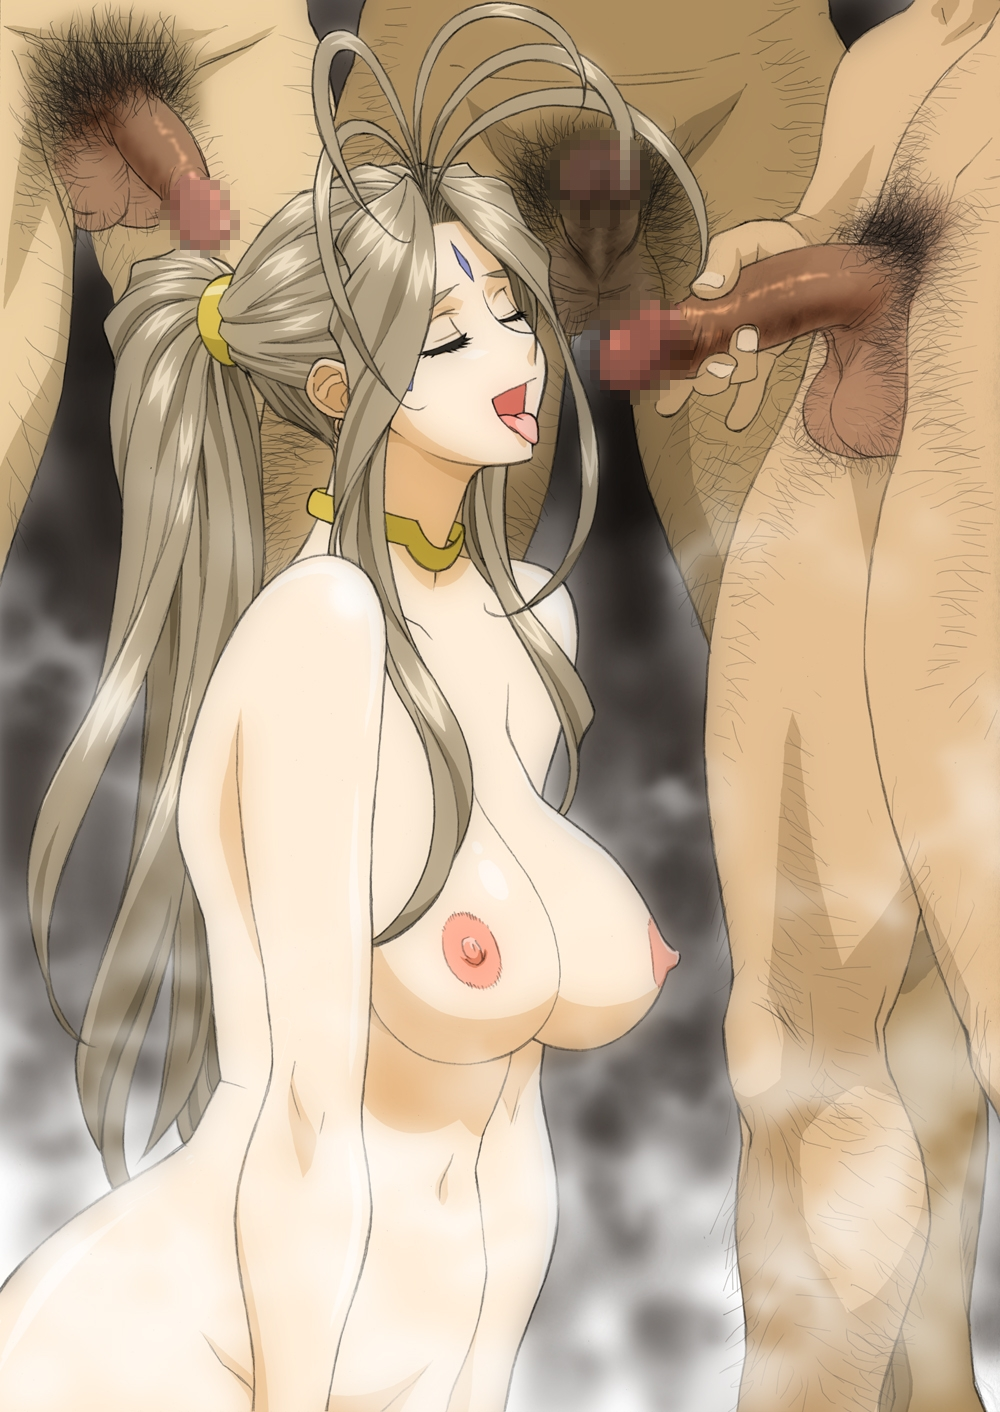 ah sex fanfiction my goddess belldandy How heavy are the dumbbells you lift